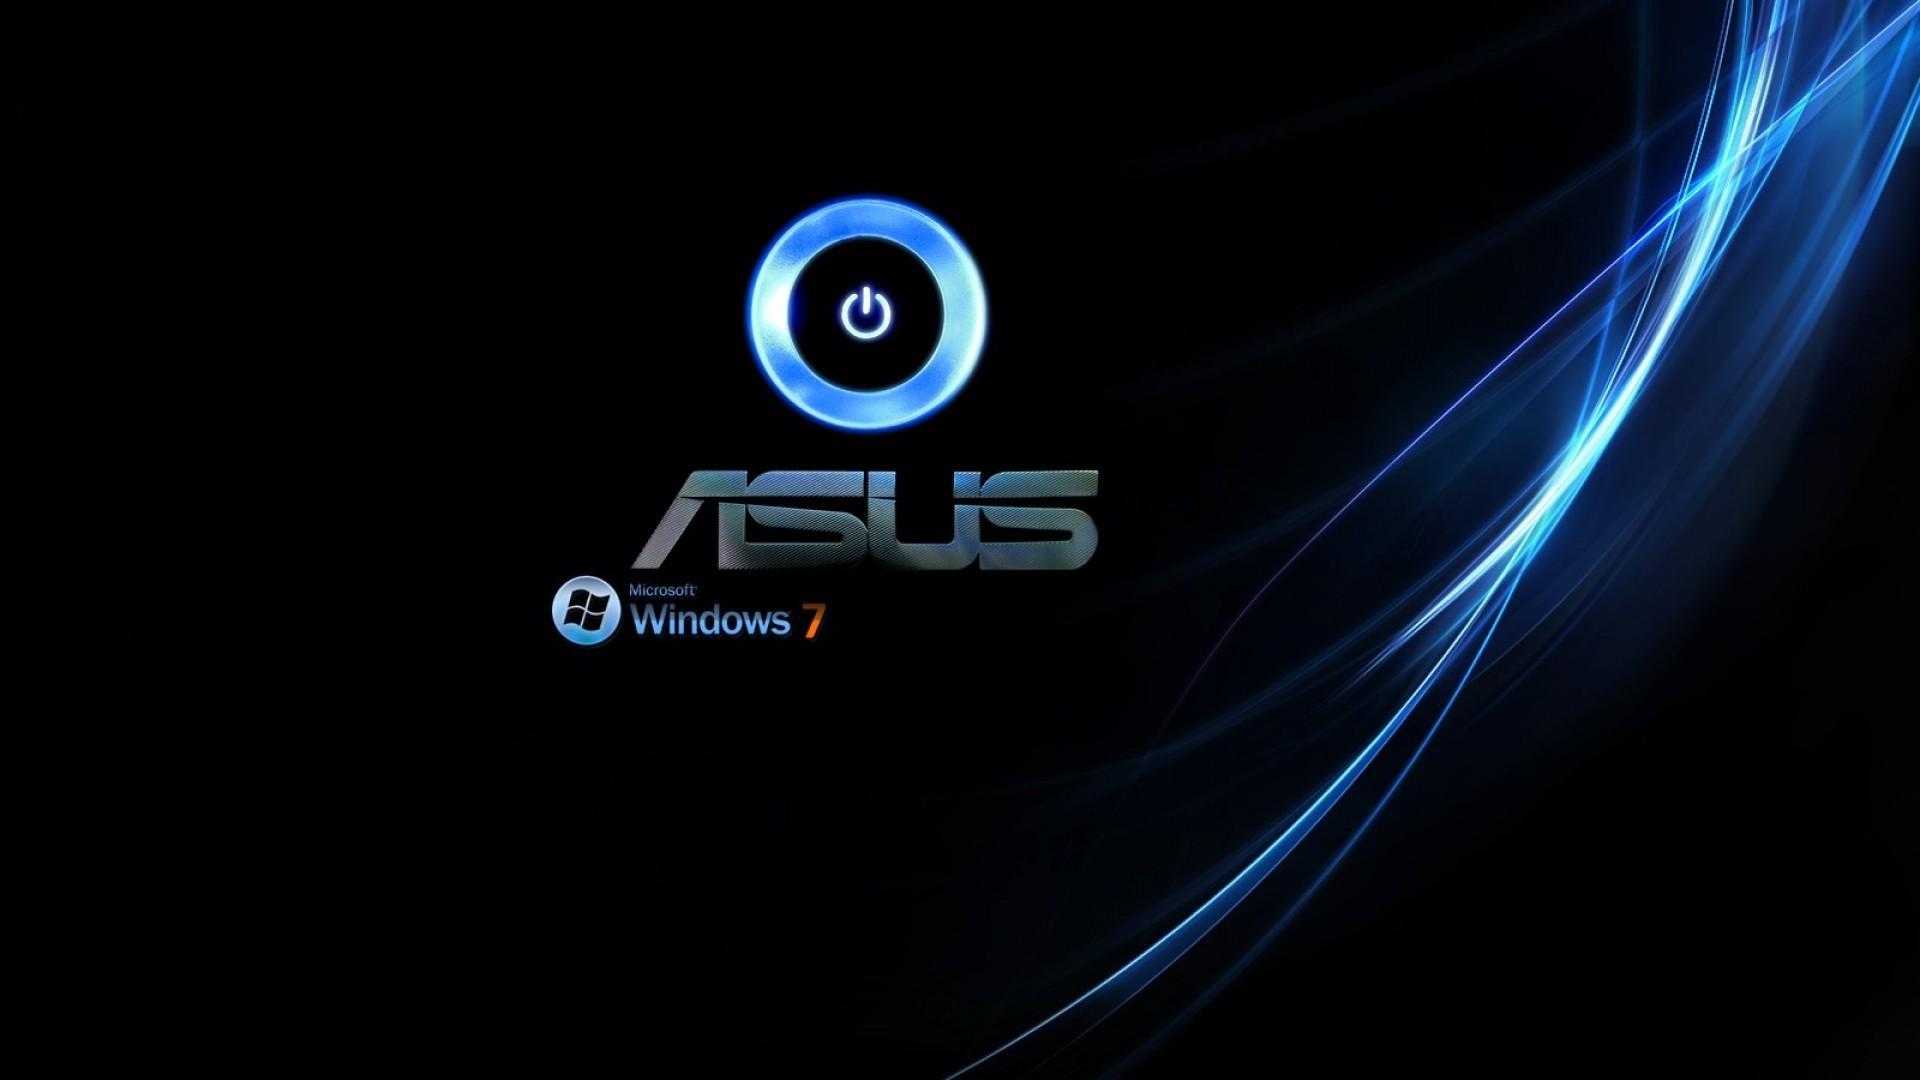 Asus Rog HD desktop wallpaper : Widescreen : High Definition 1920×1080 Wallpapers  Asus (